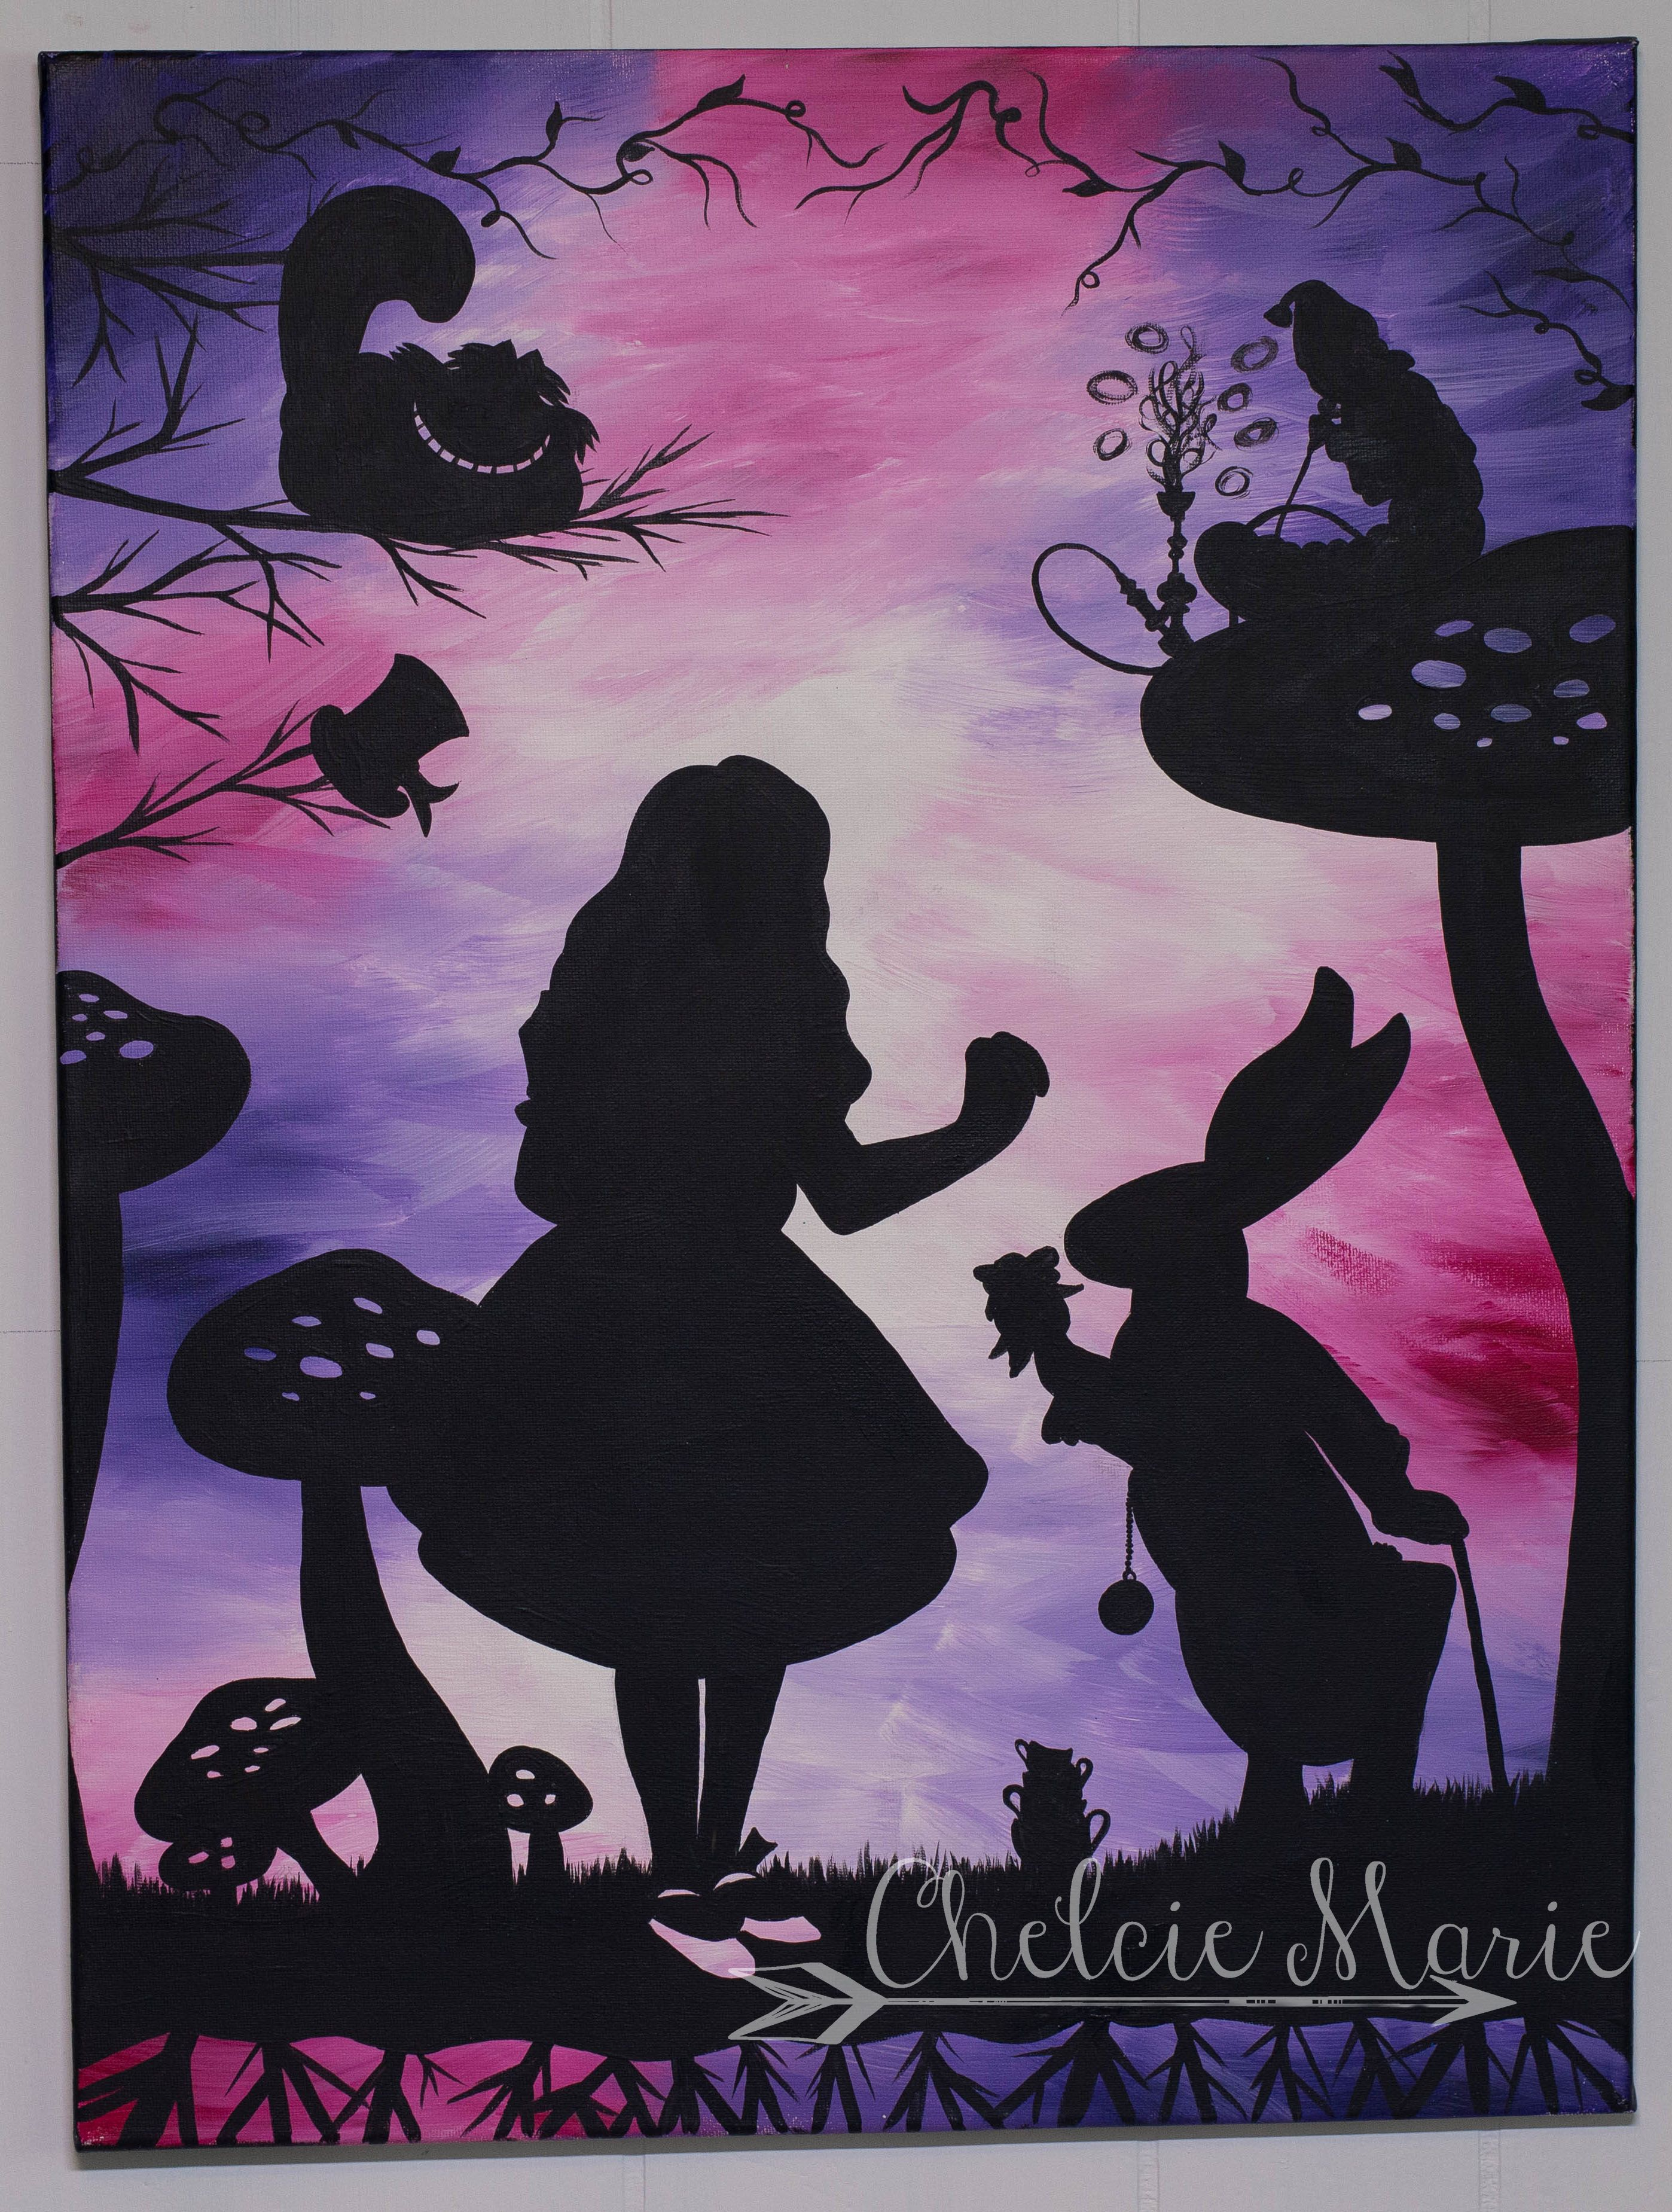 Alice in Wonderland Art for sale Original hand painted ...